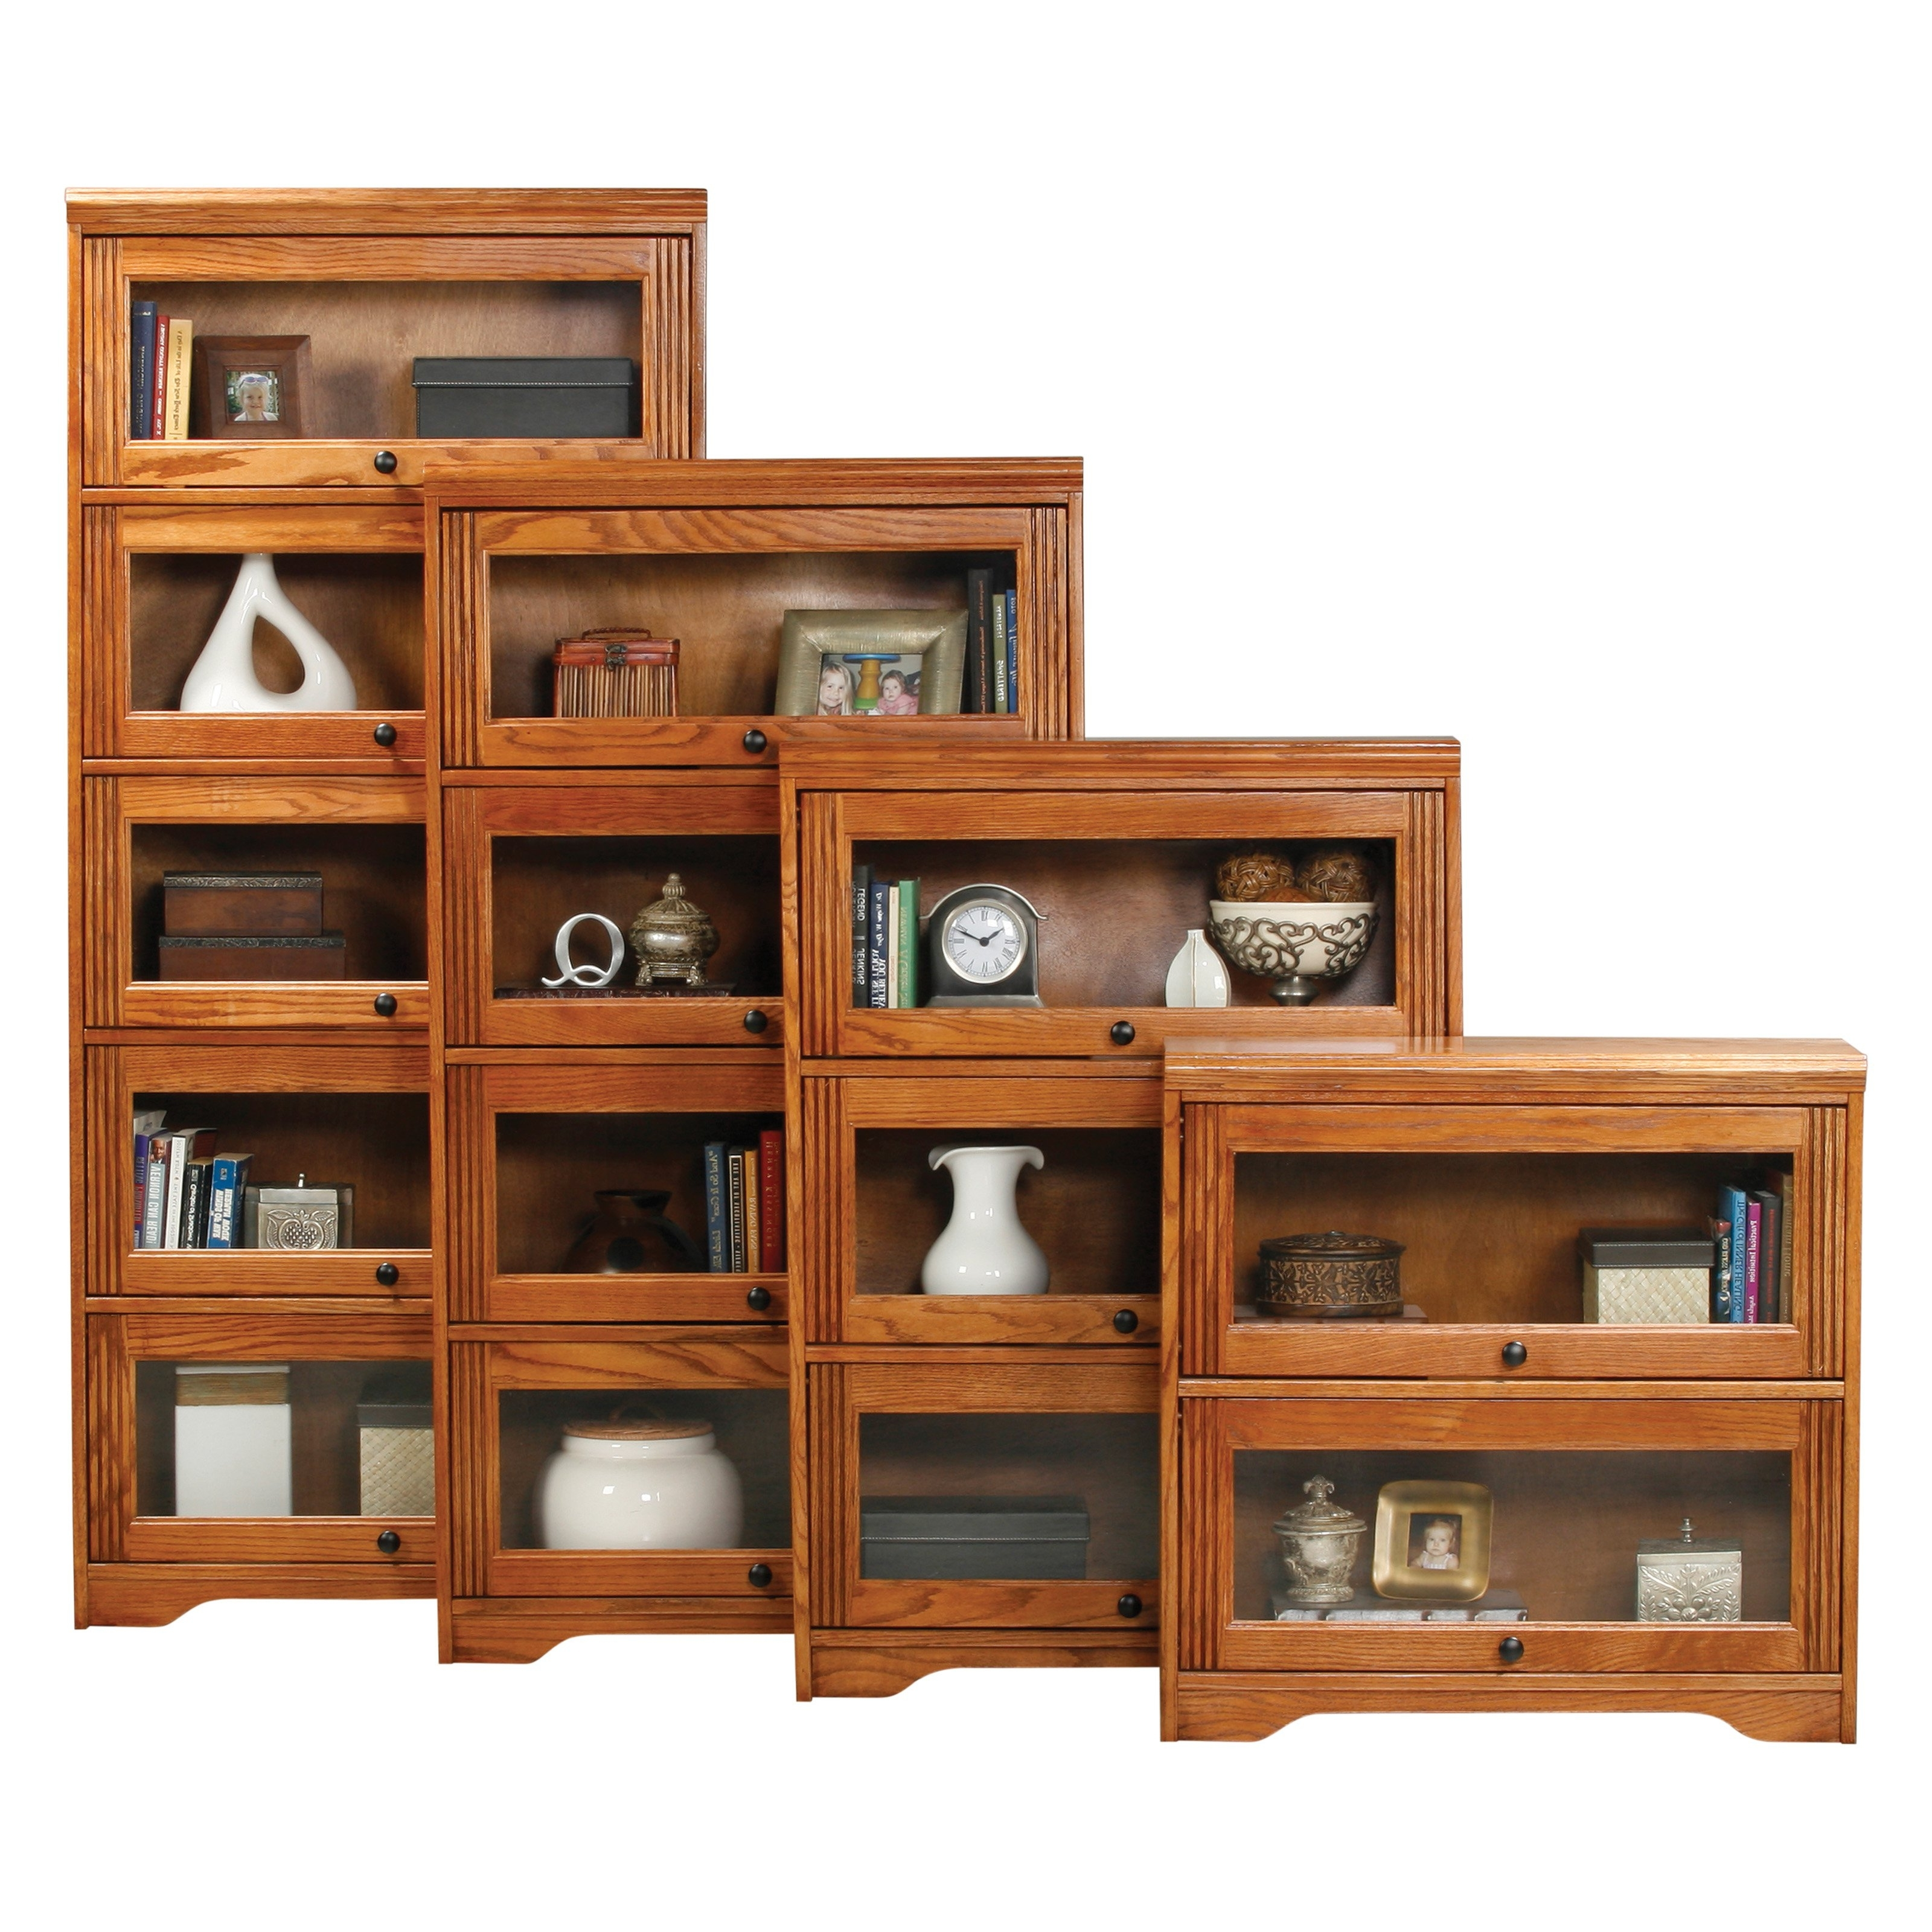 Recent Barrister Bookcases Regarding Altra Barrister Bookcase – Espresso (View 9 of 15)